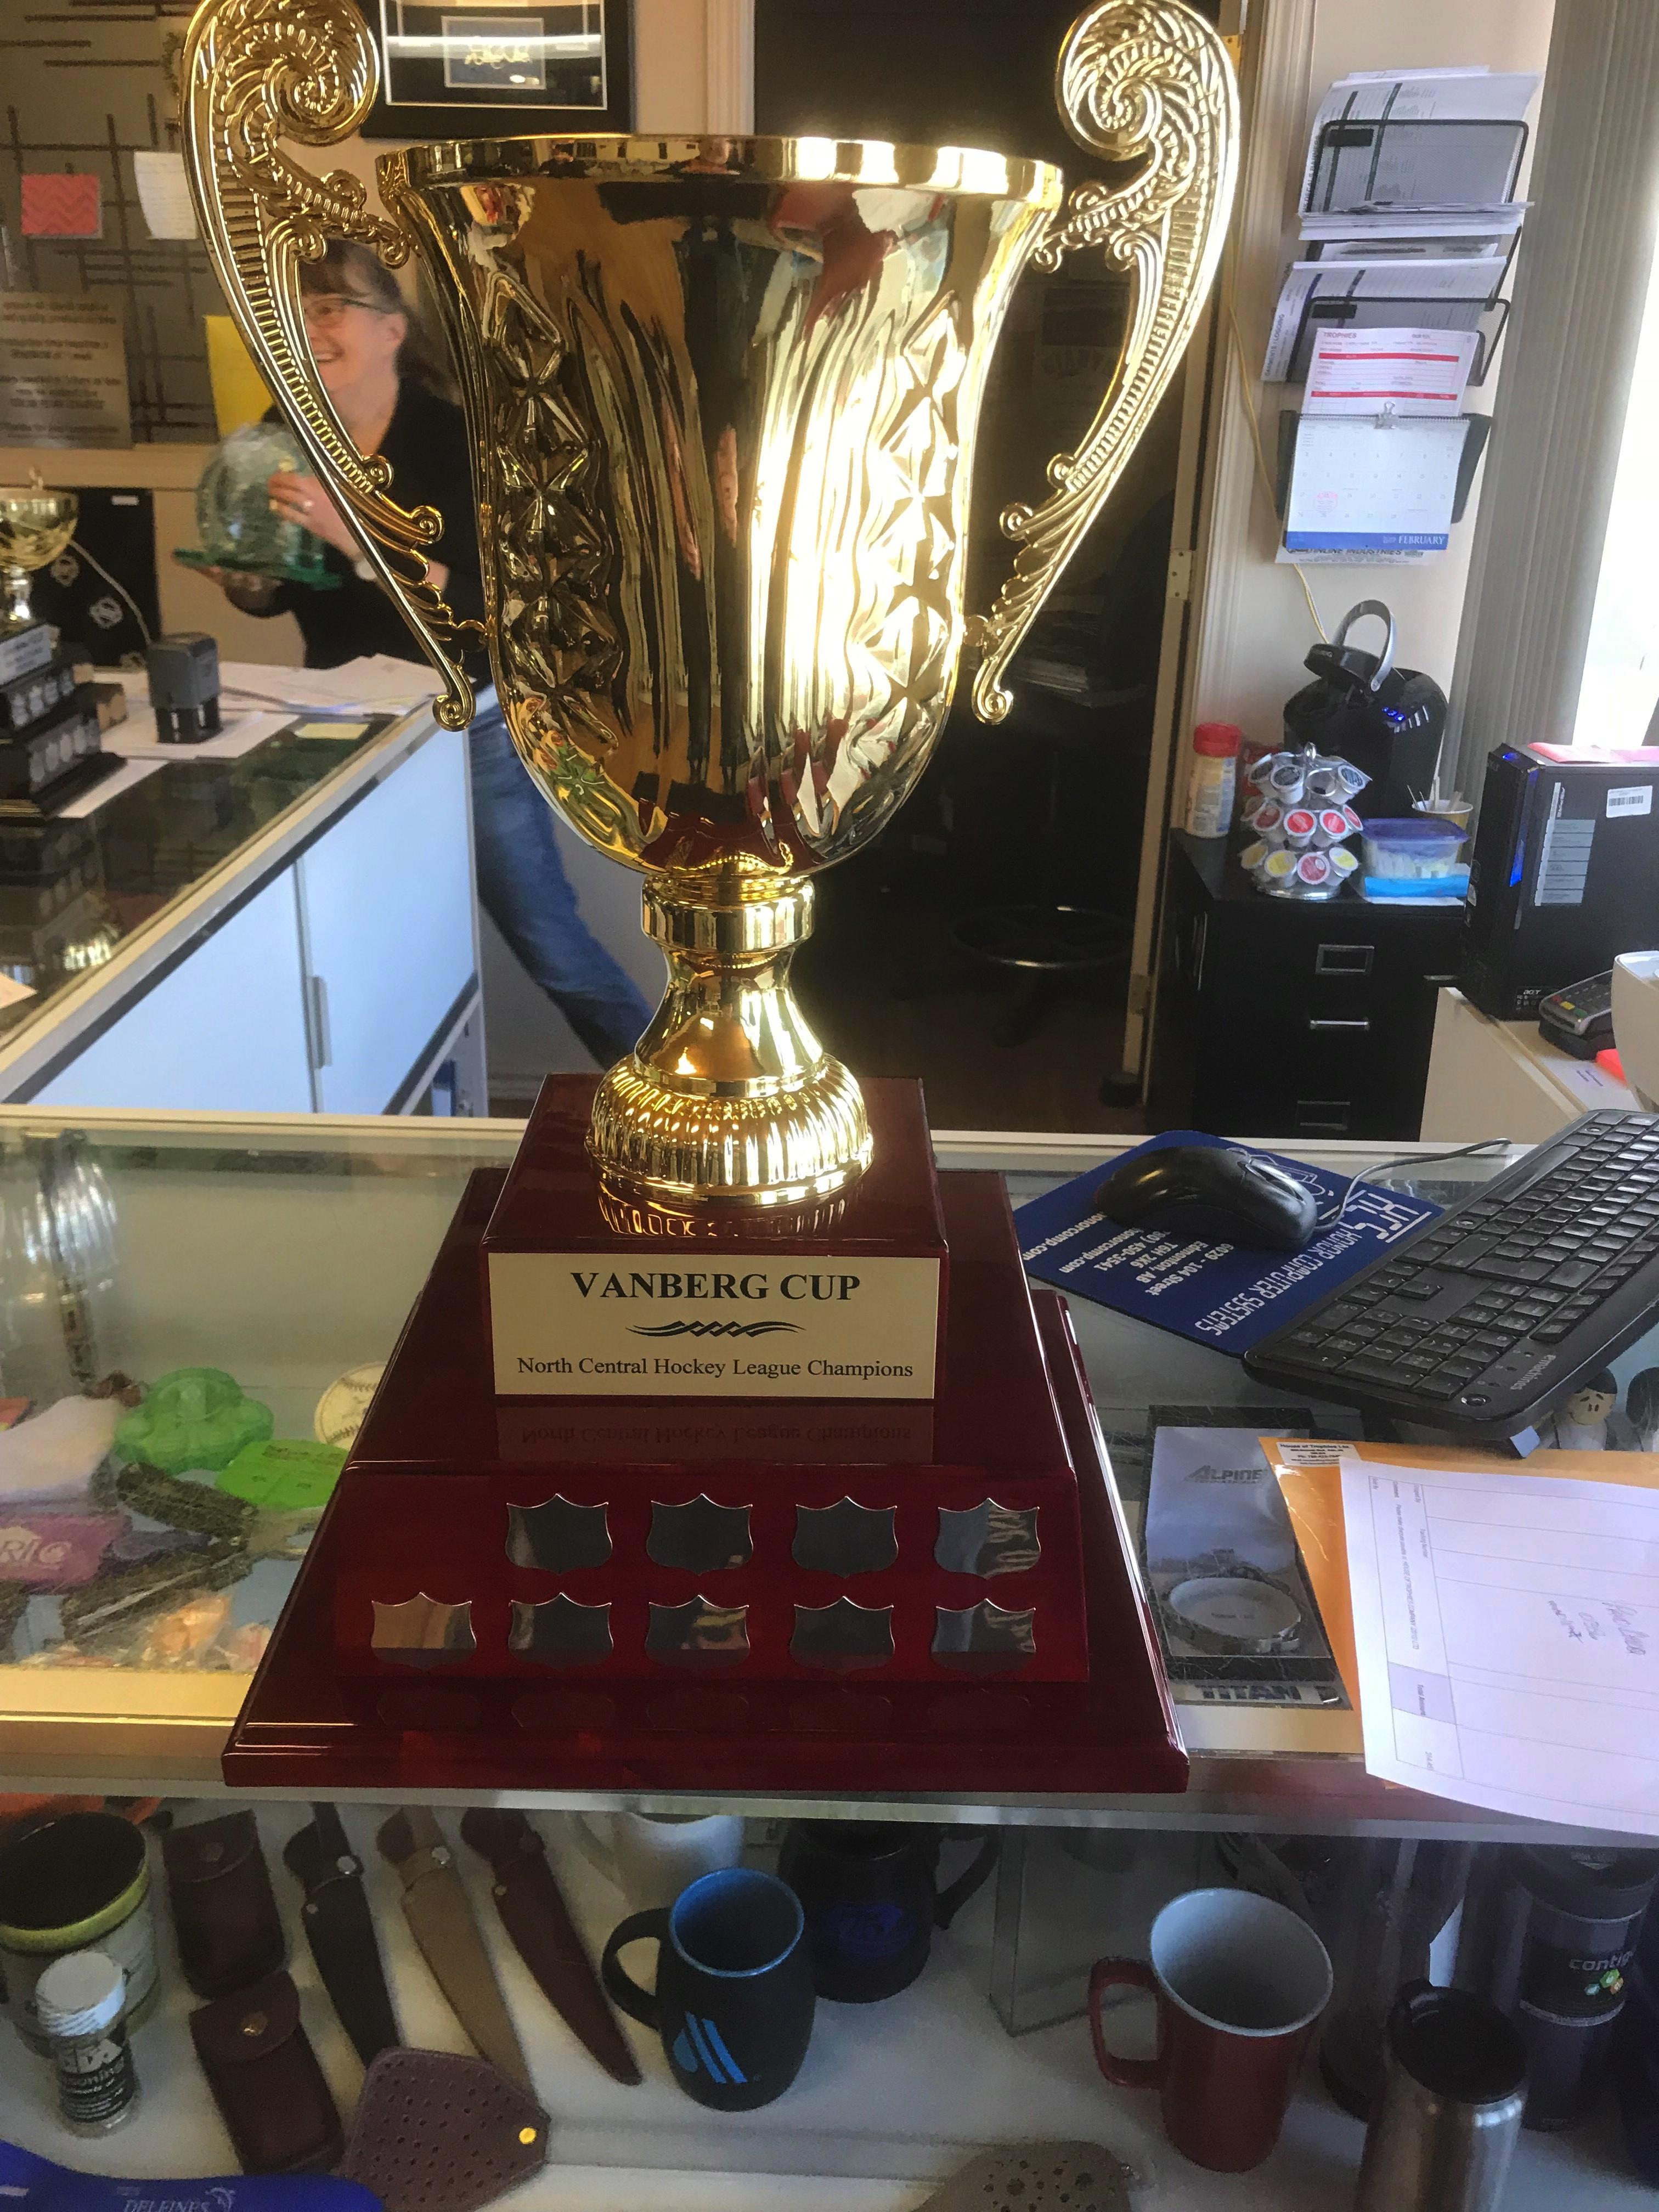 Vanberg Cup